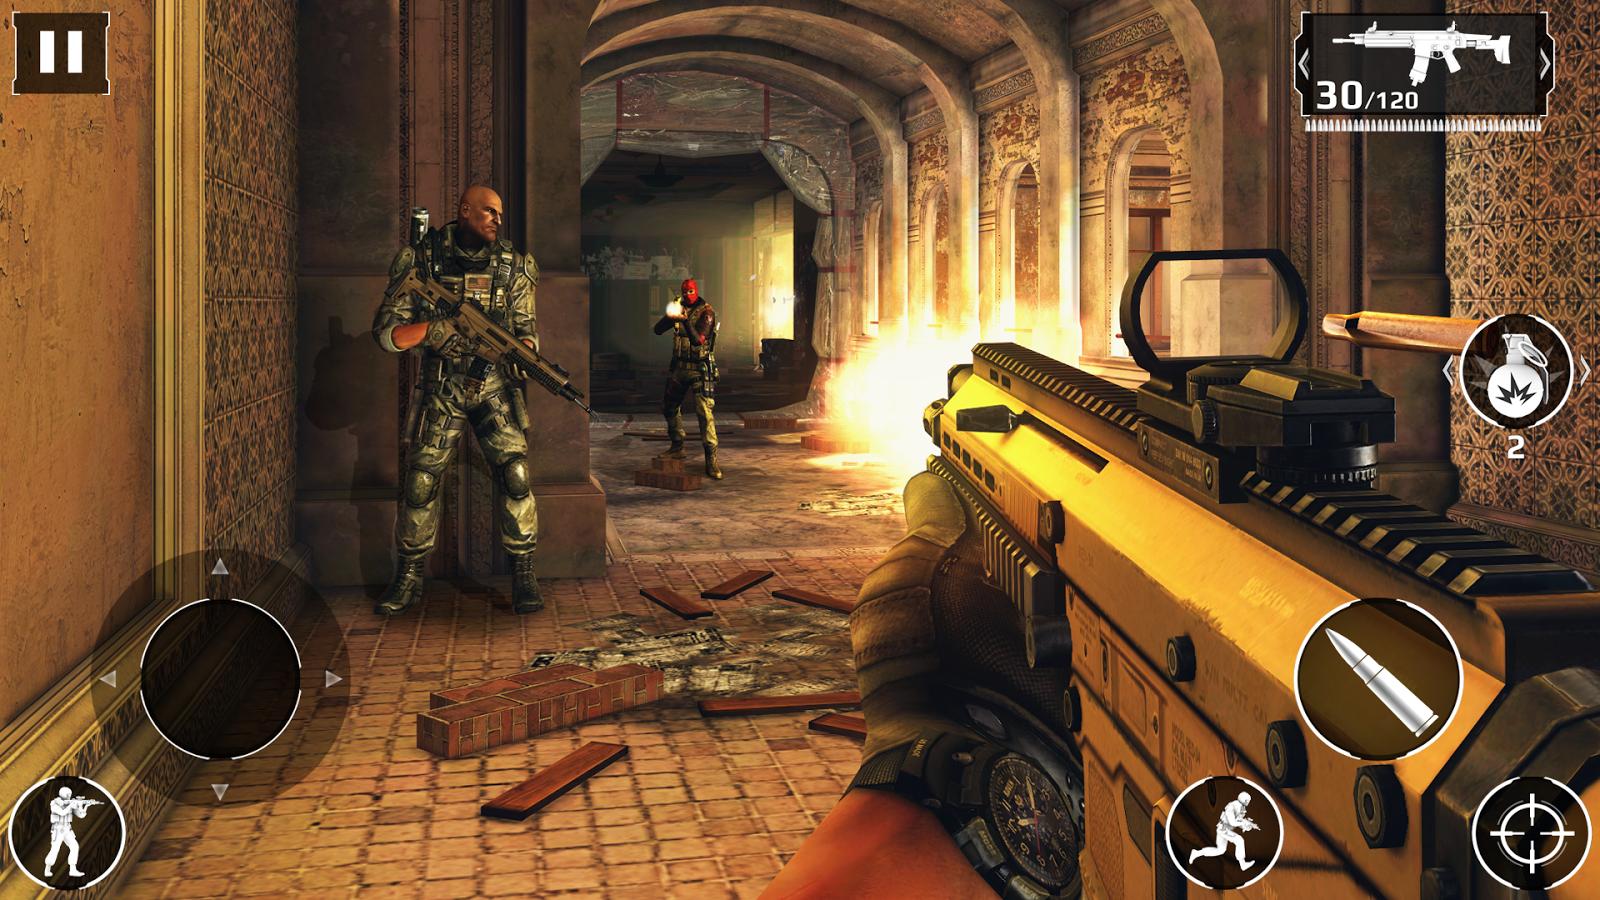 Modern Combat 5: Затмение / Modern Combat 5: Blackout [v1.0.1] [iOS 7.0] [RUS] [Игры для iPhone/iPad/iPod]